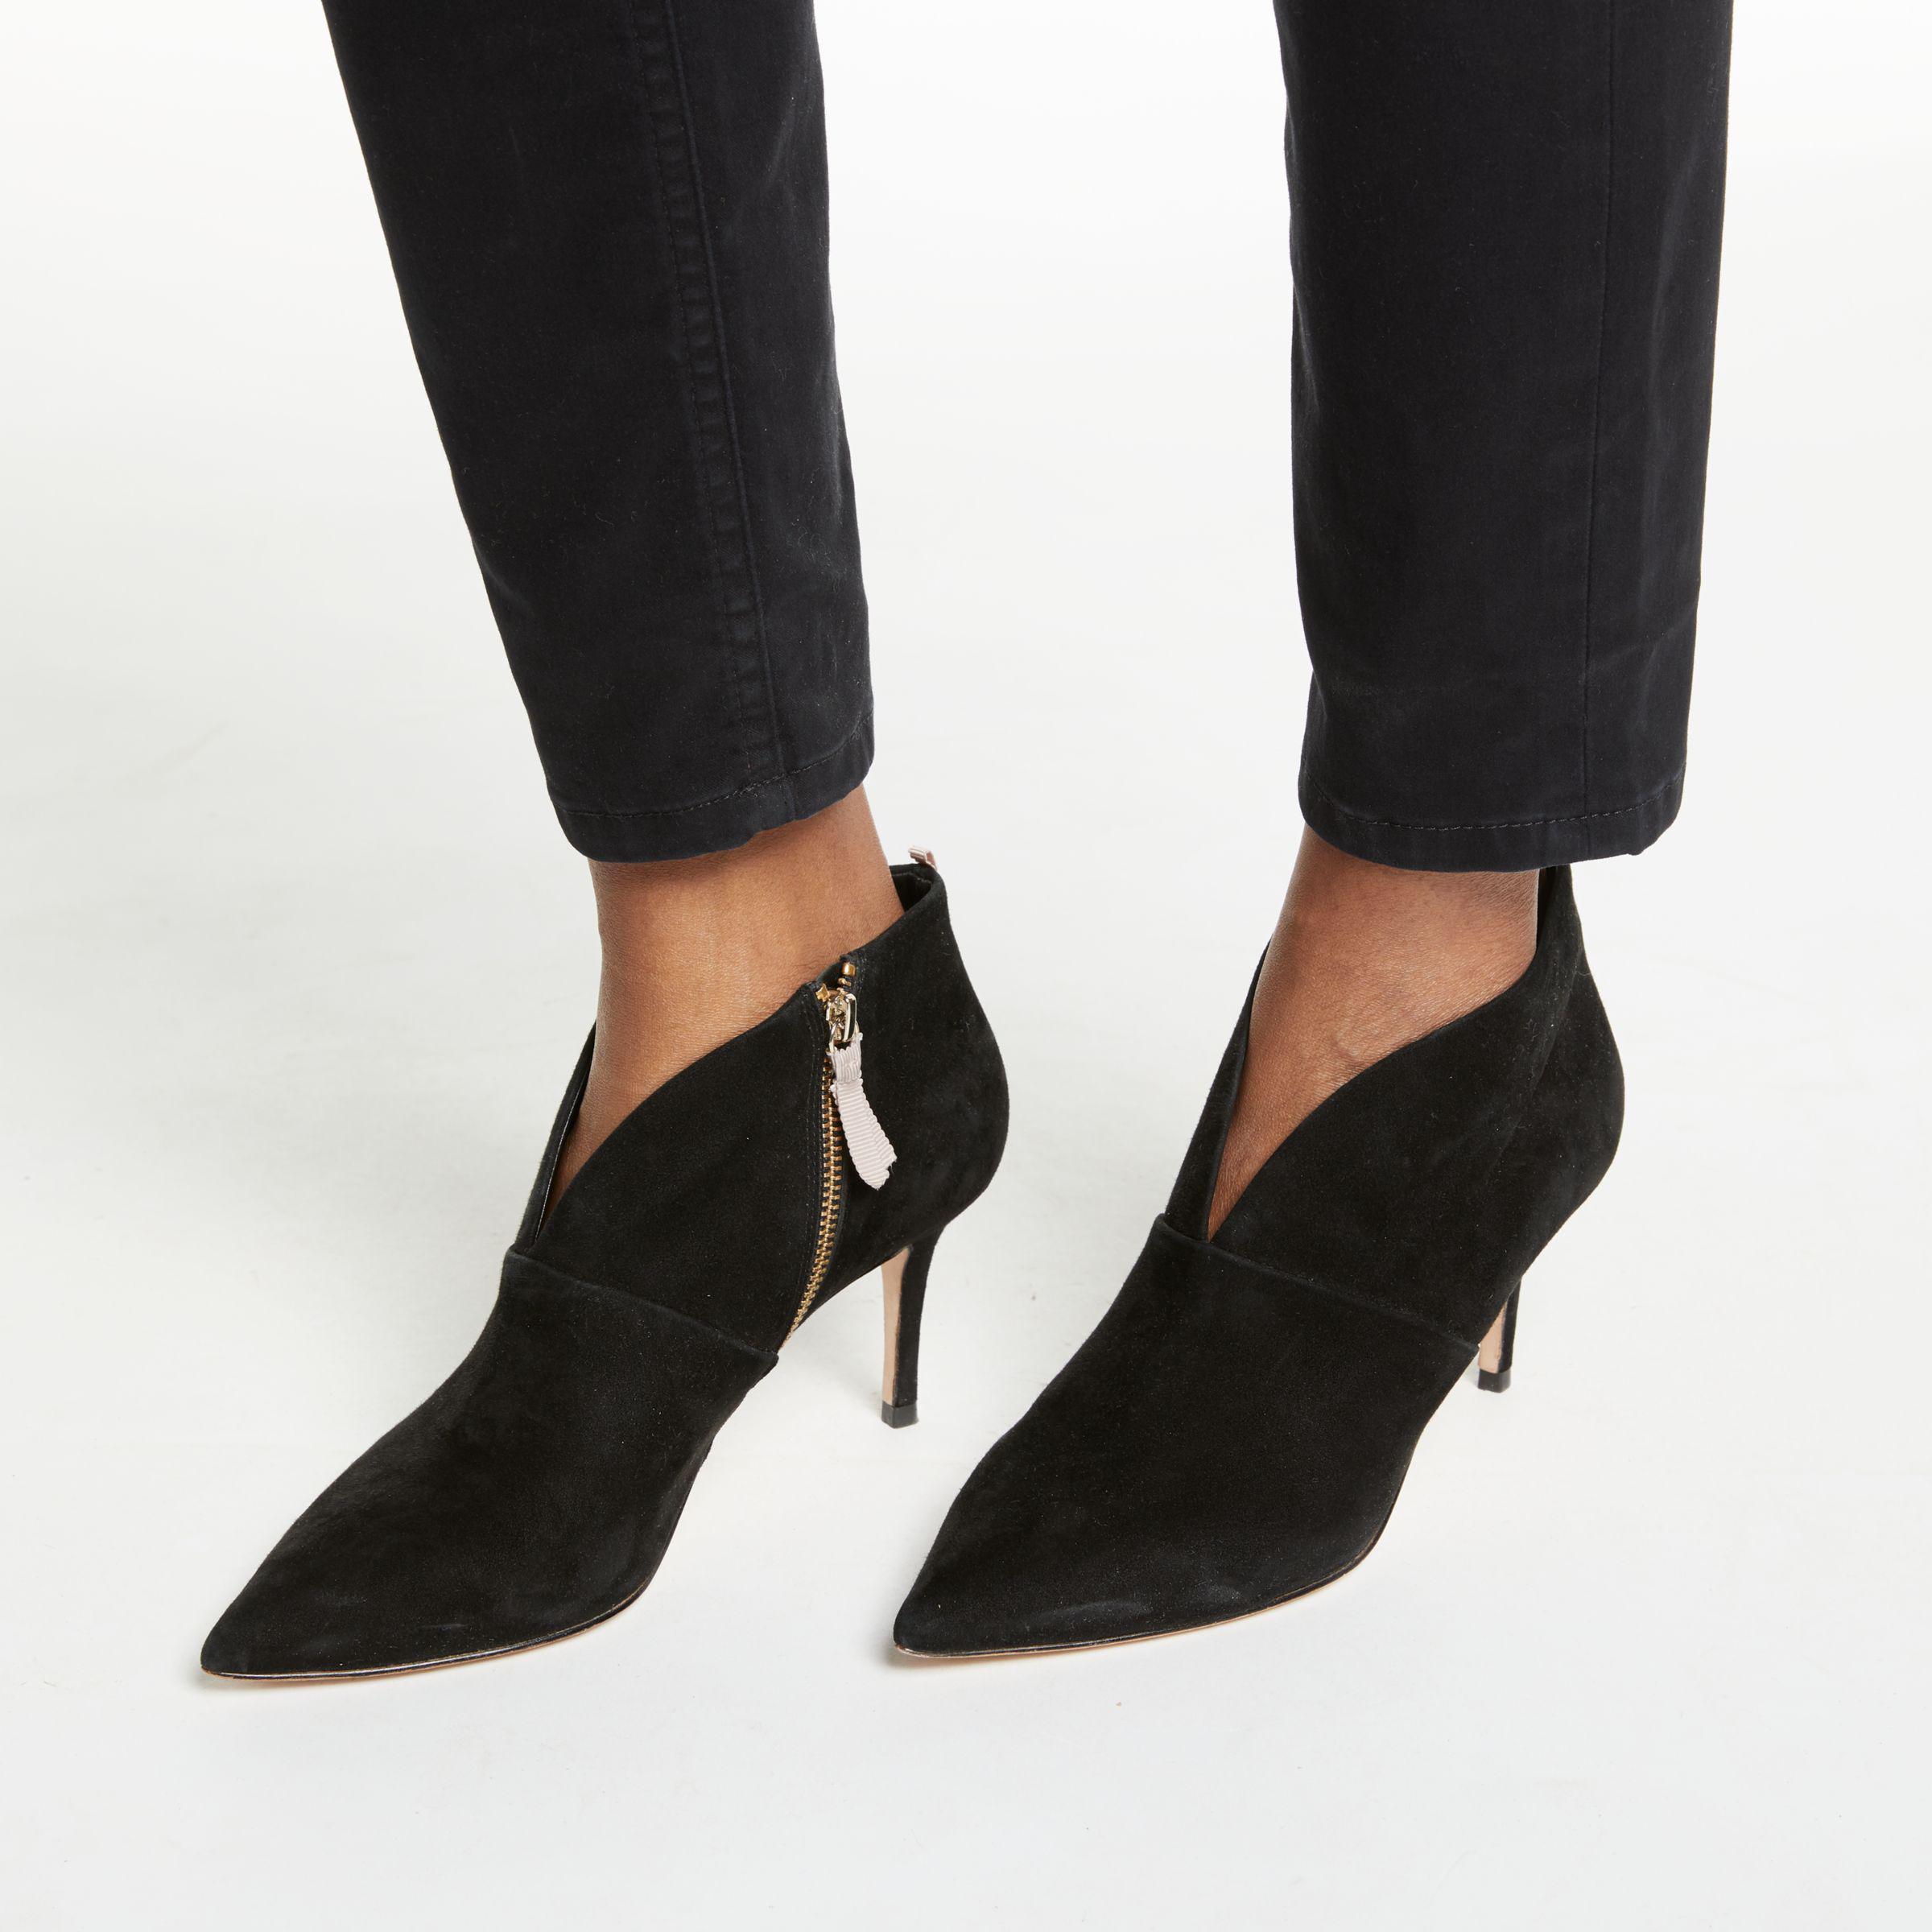 1334c75d5bd John Lewis Boden Alexa Stiletto Heeled Ankle Boots in Black - Lyst